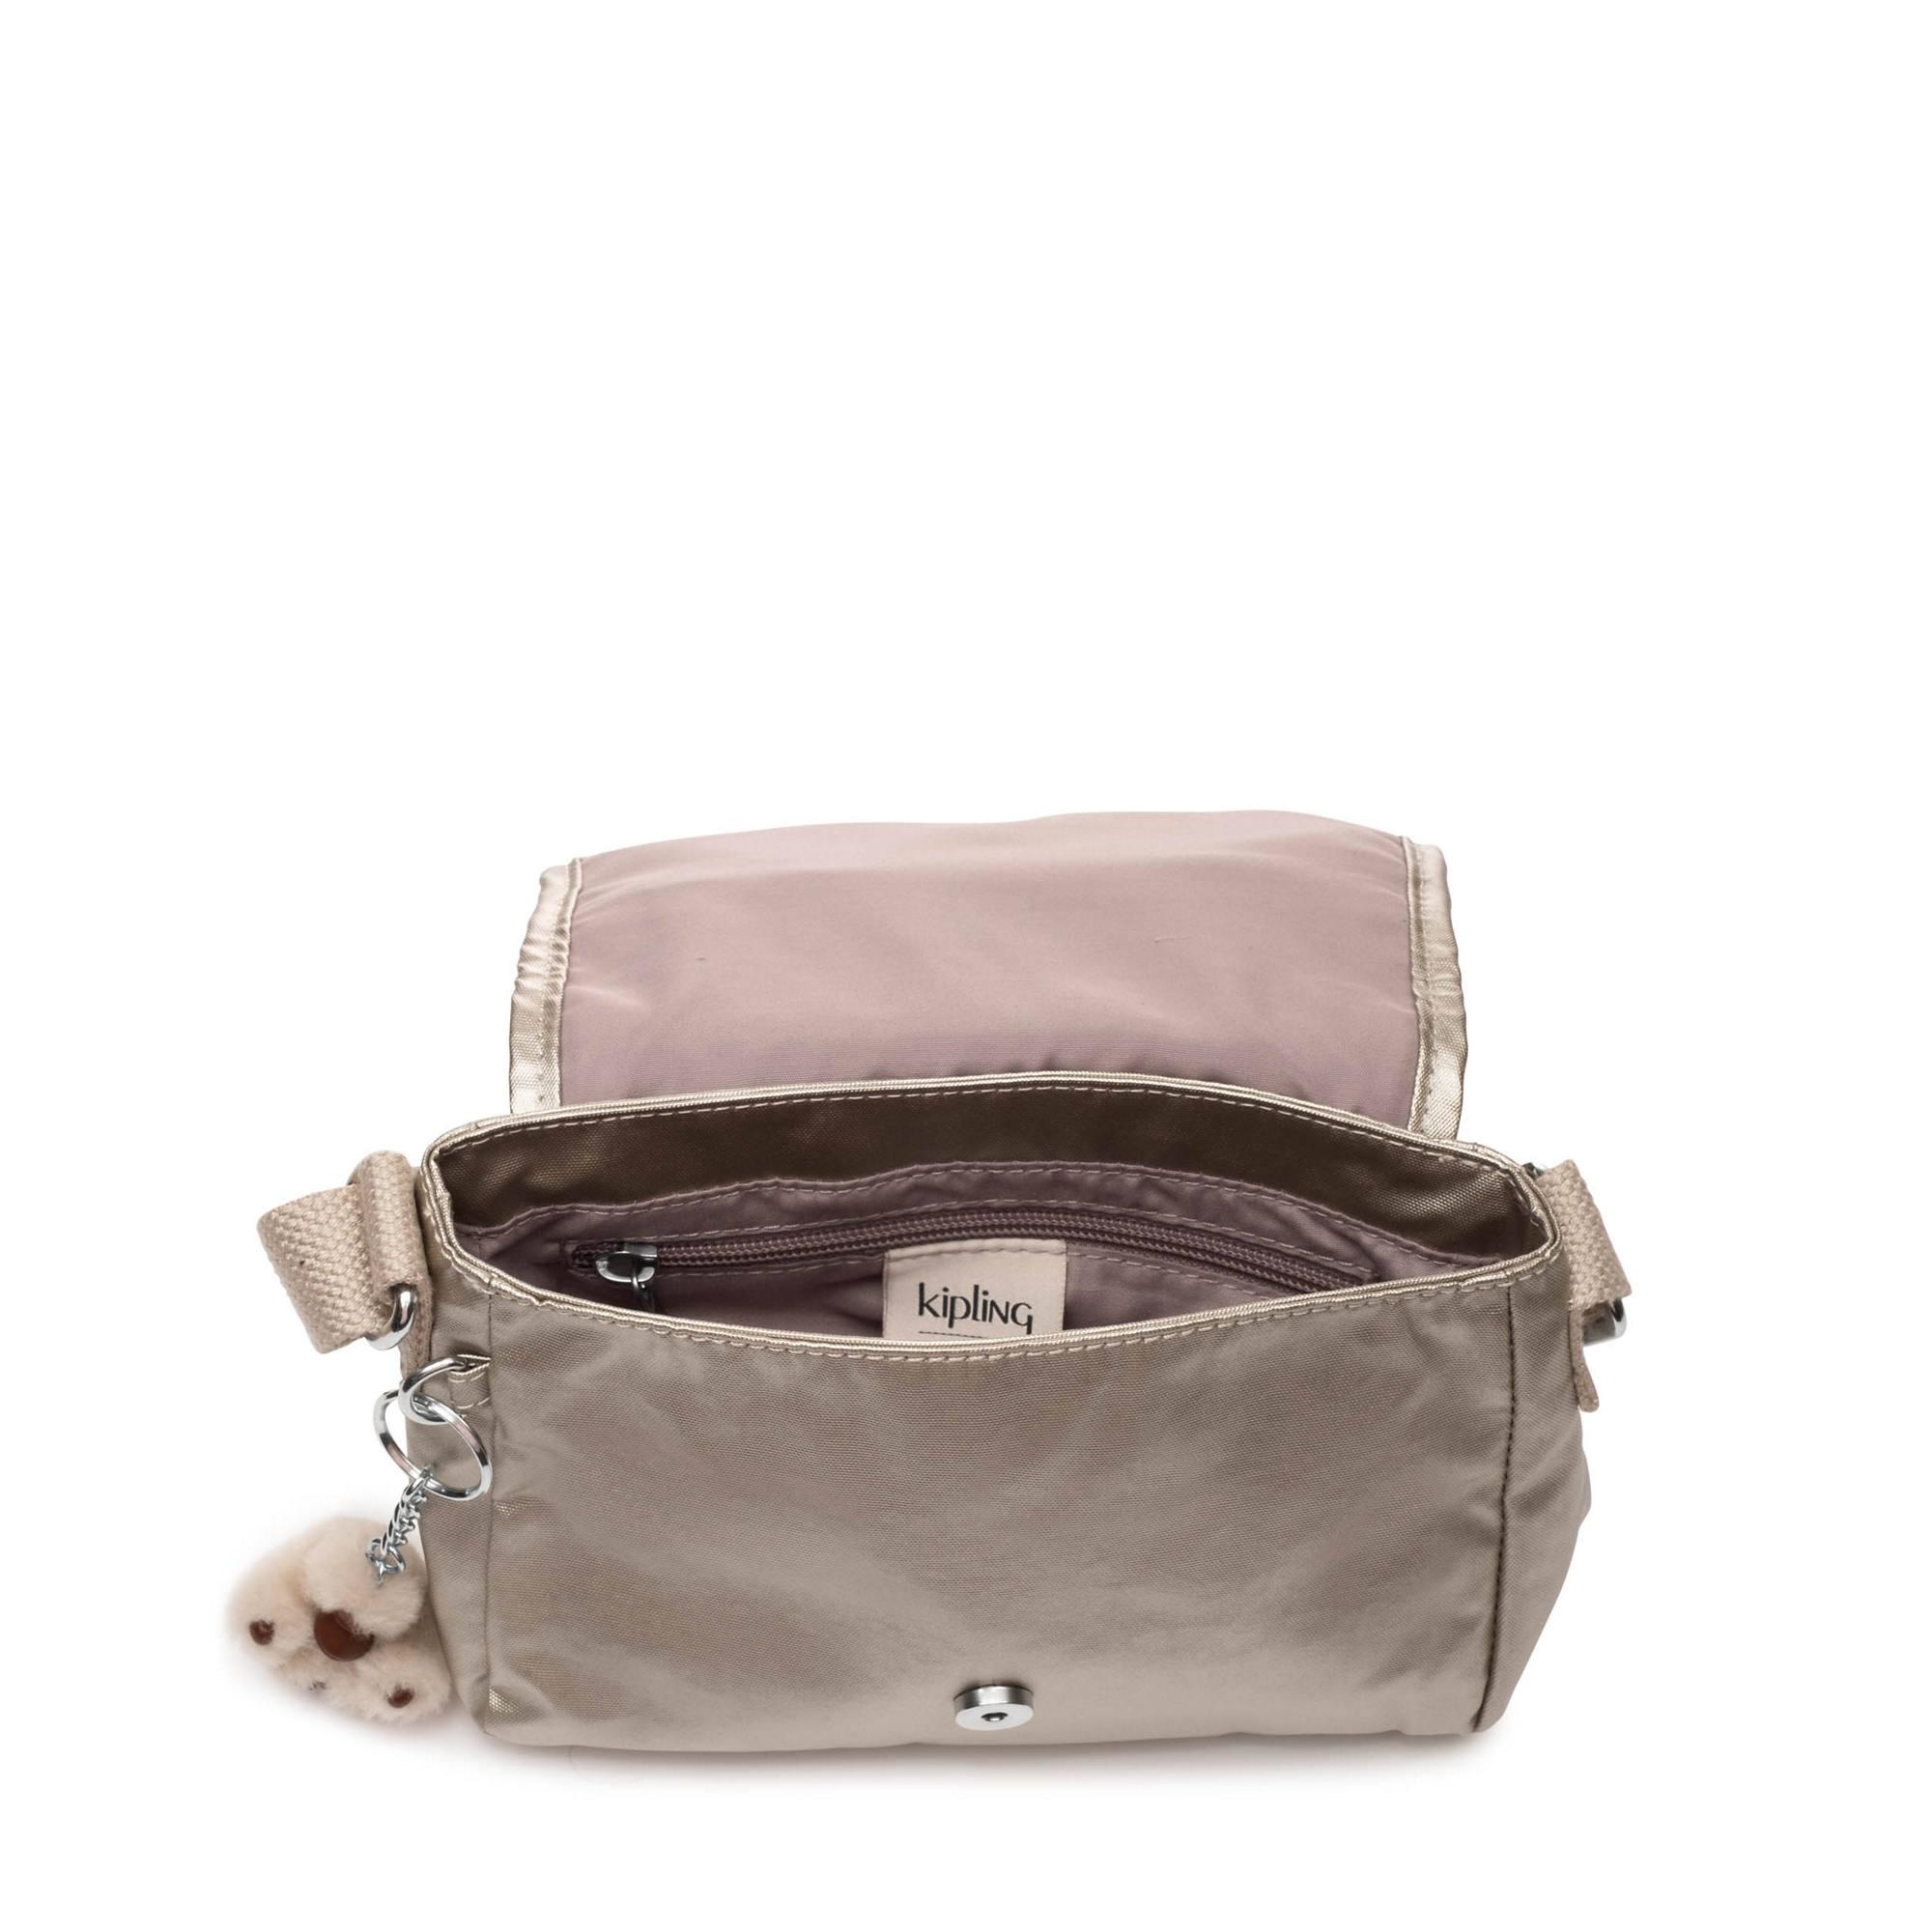 cc512bfe20d1 Sabian Crossbody Metallic Mini Bag